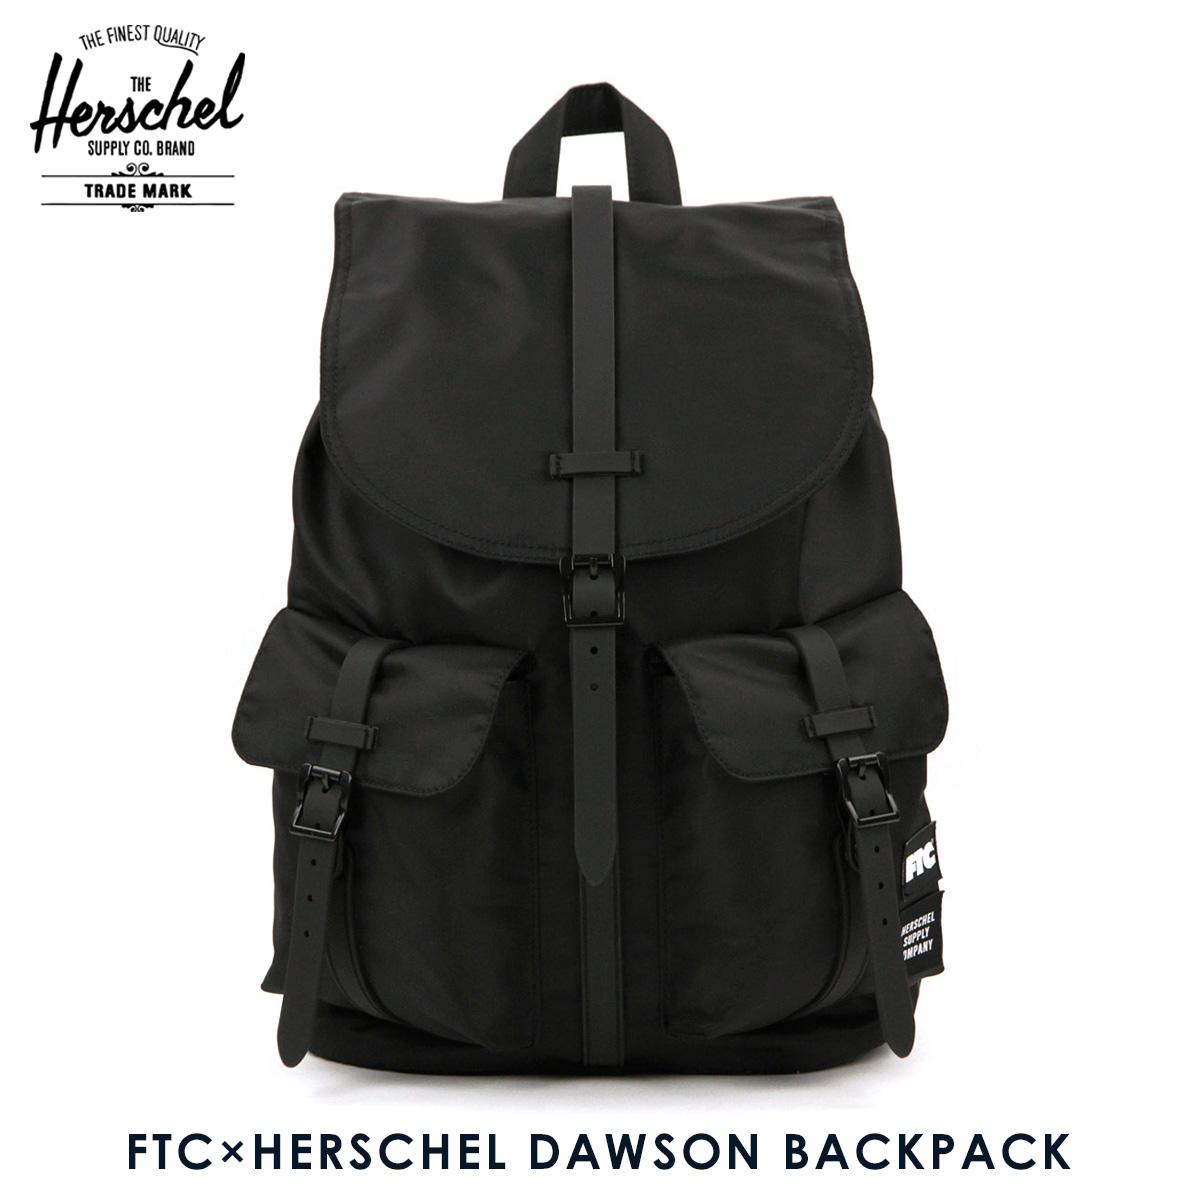 Hershel Herschel Bag Backpack Ftc X Dawson Ftc018hsa01black 20 5l